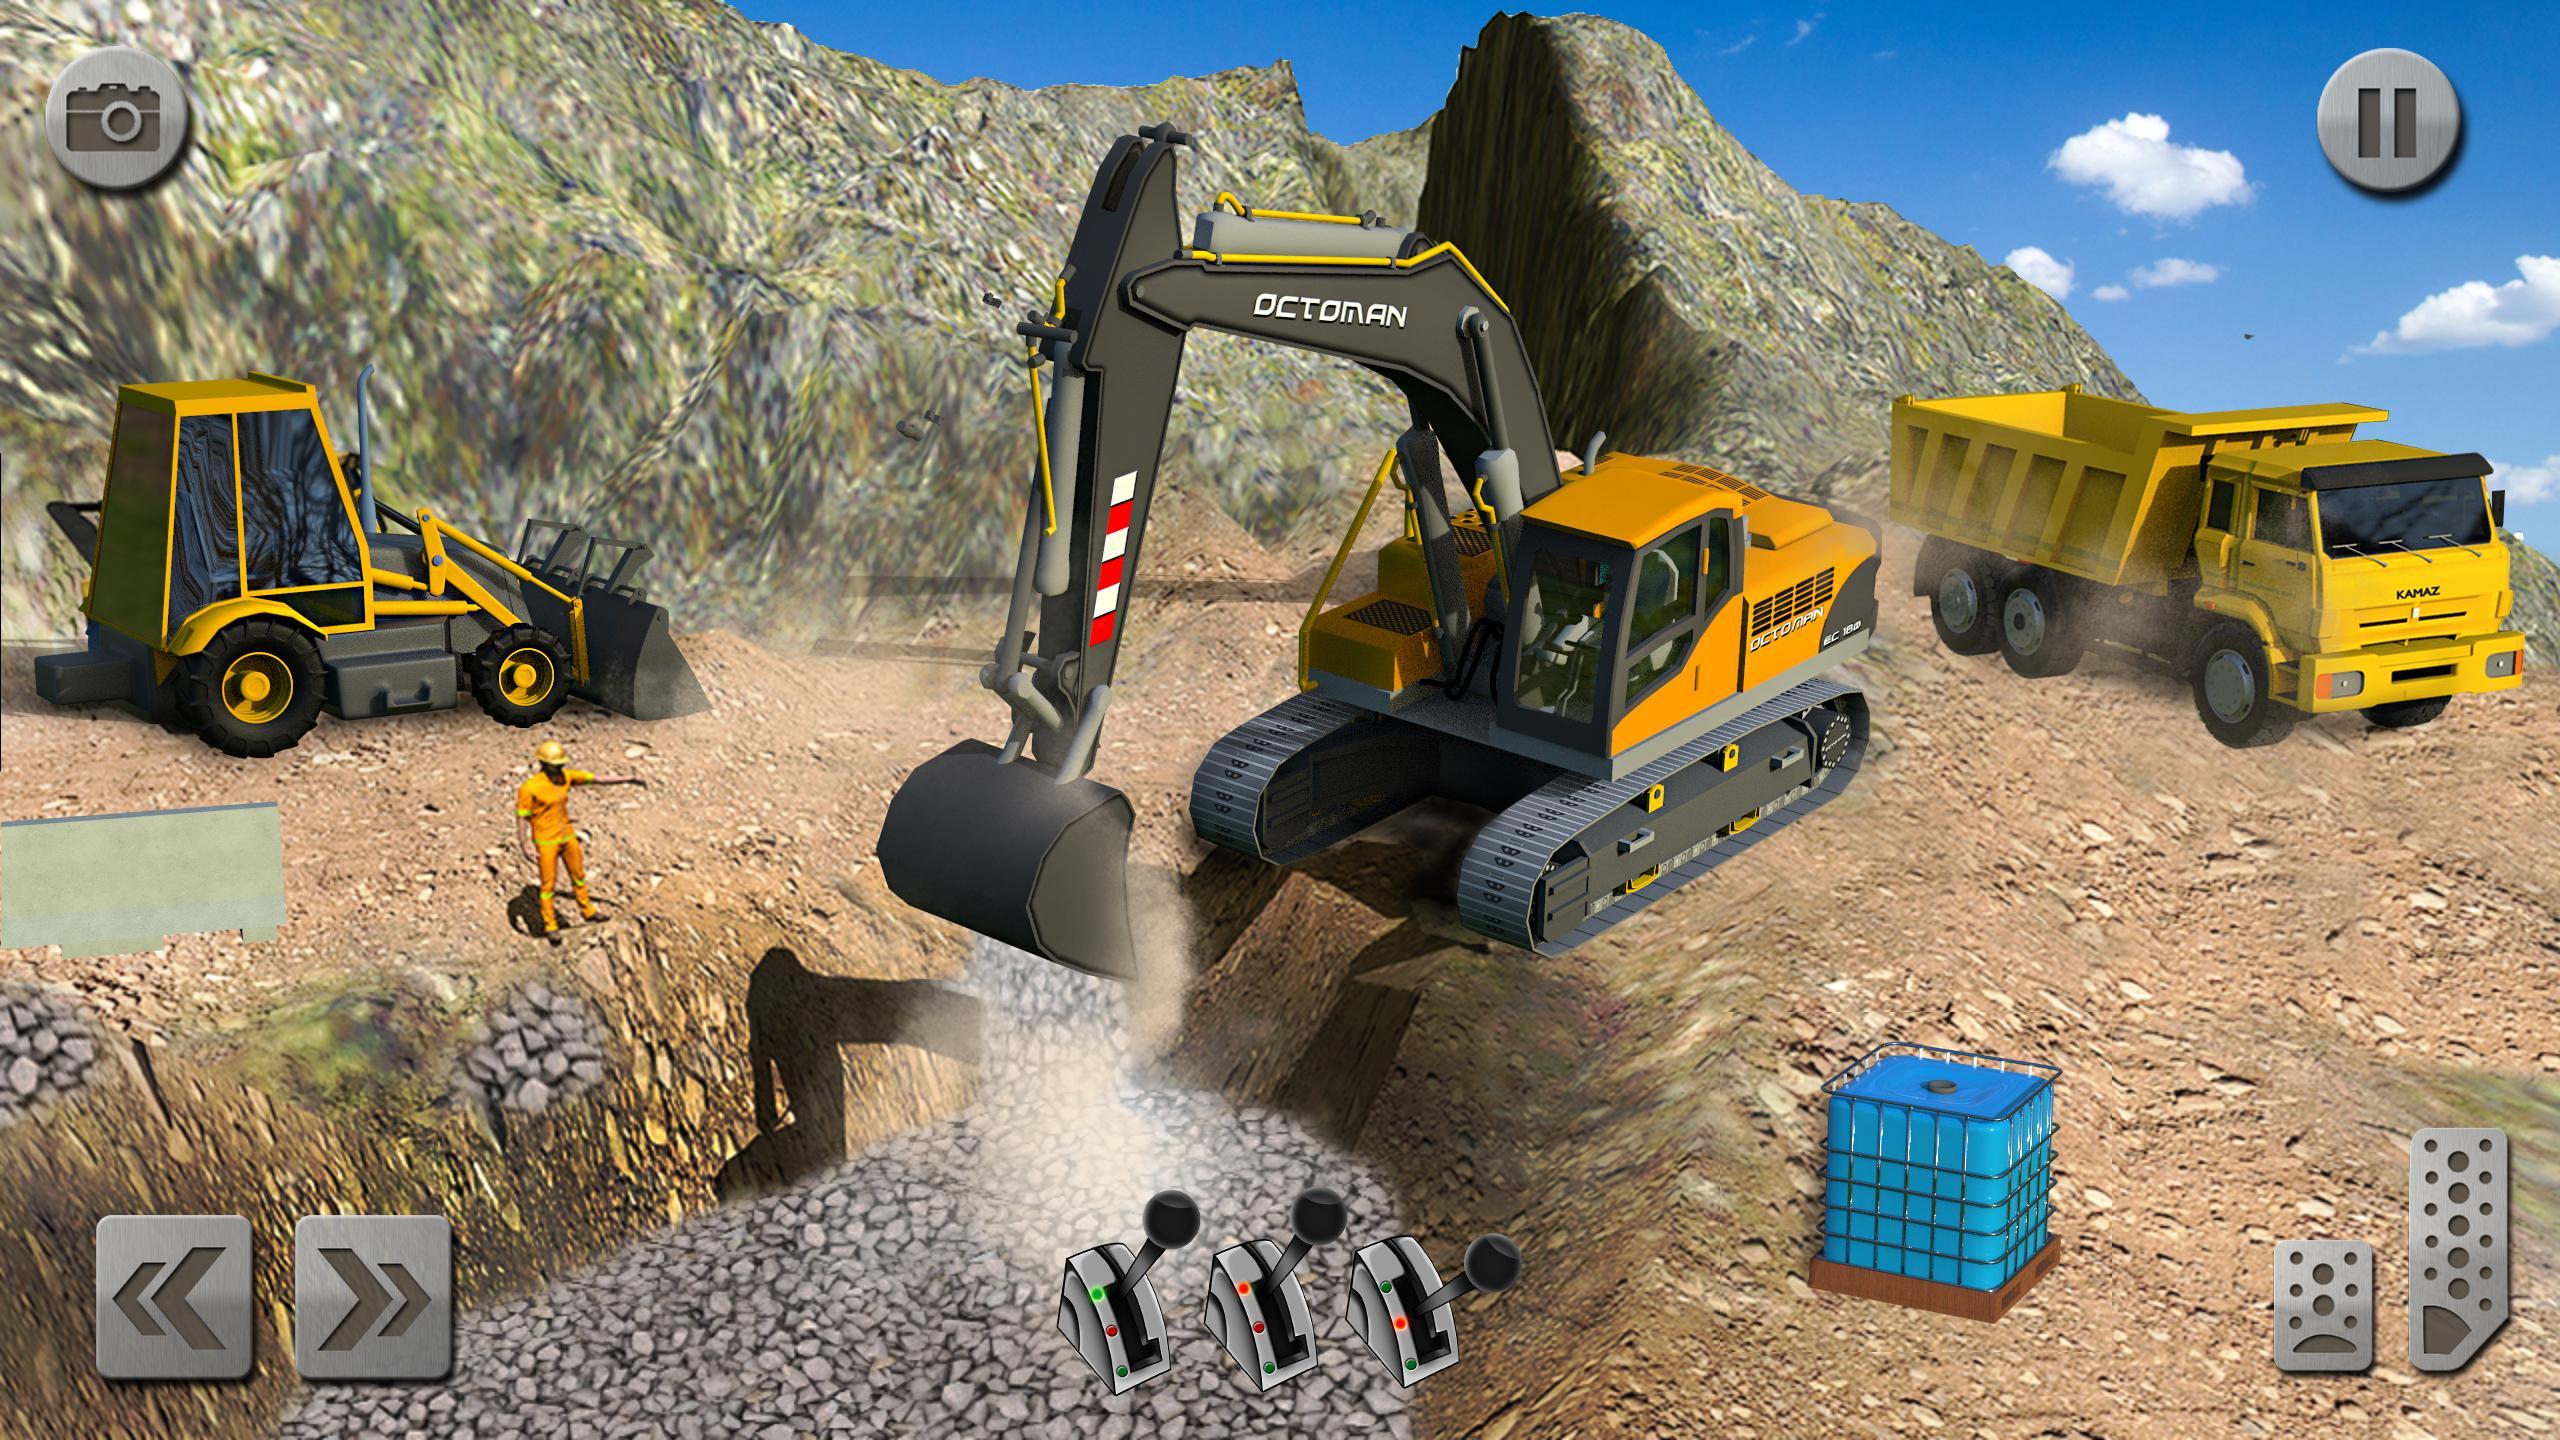 Sand Excavator Truck Driving Rescue Simulator game 5.2 Screenshot 3